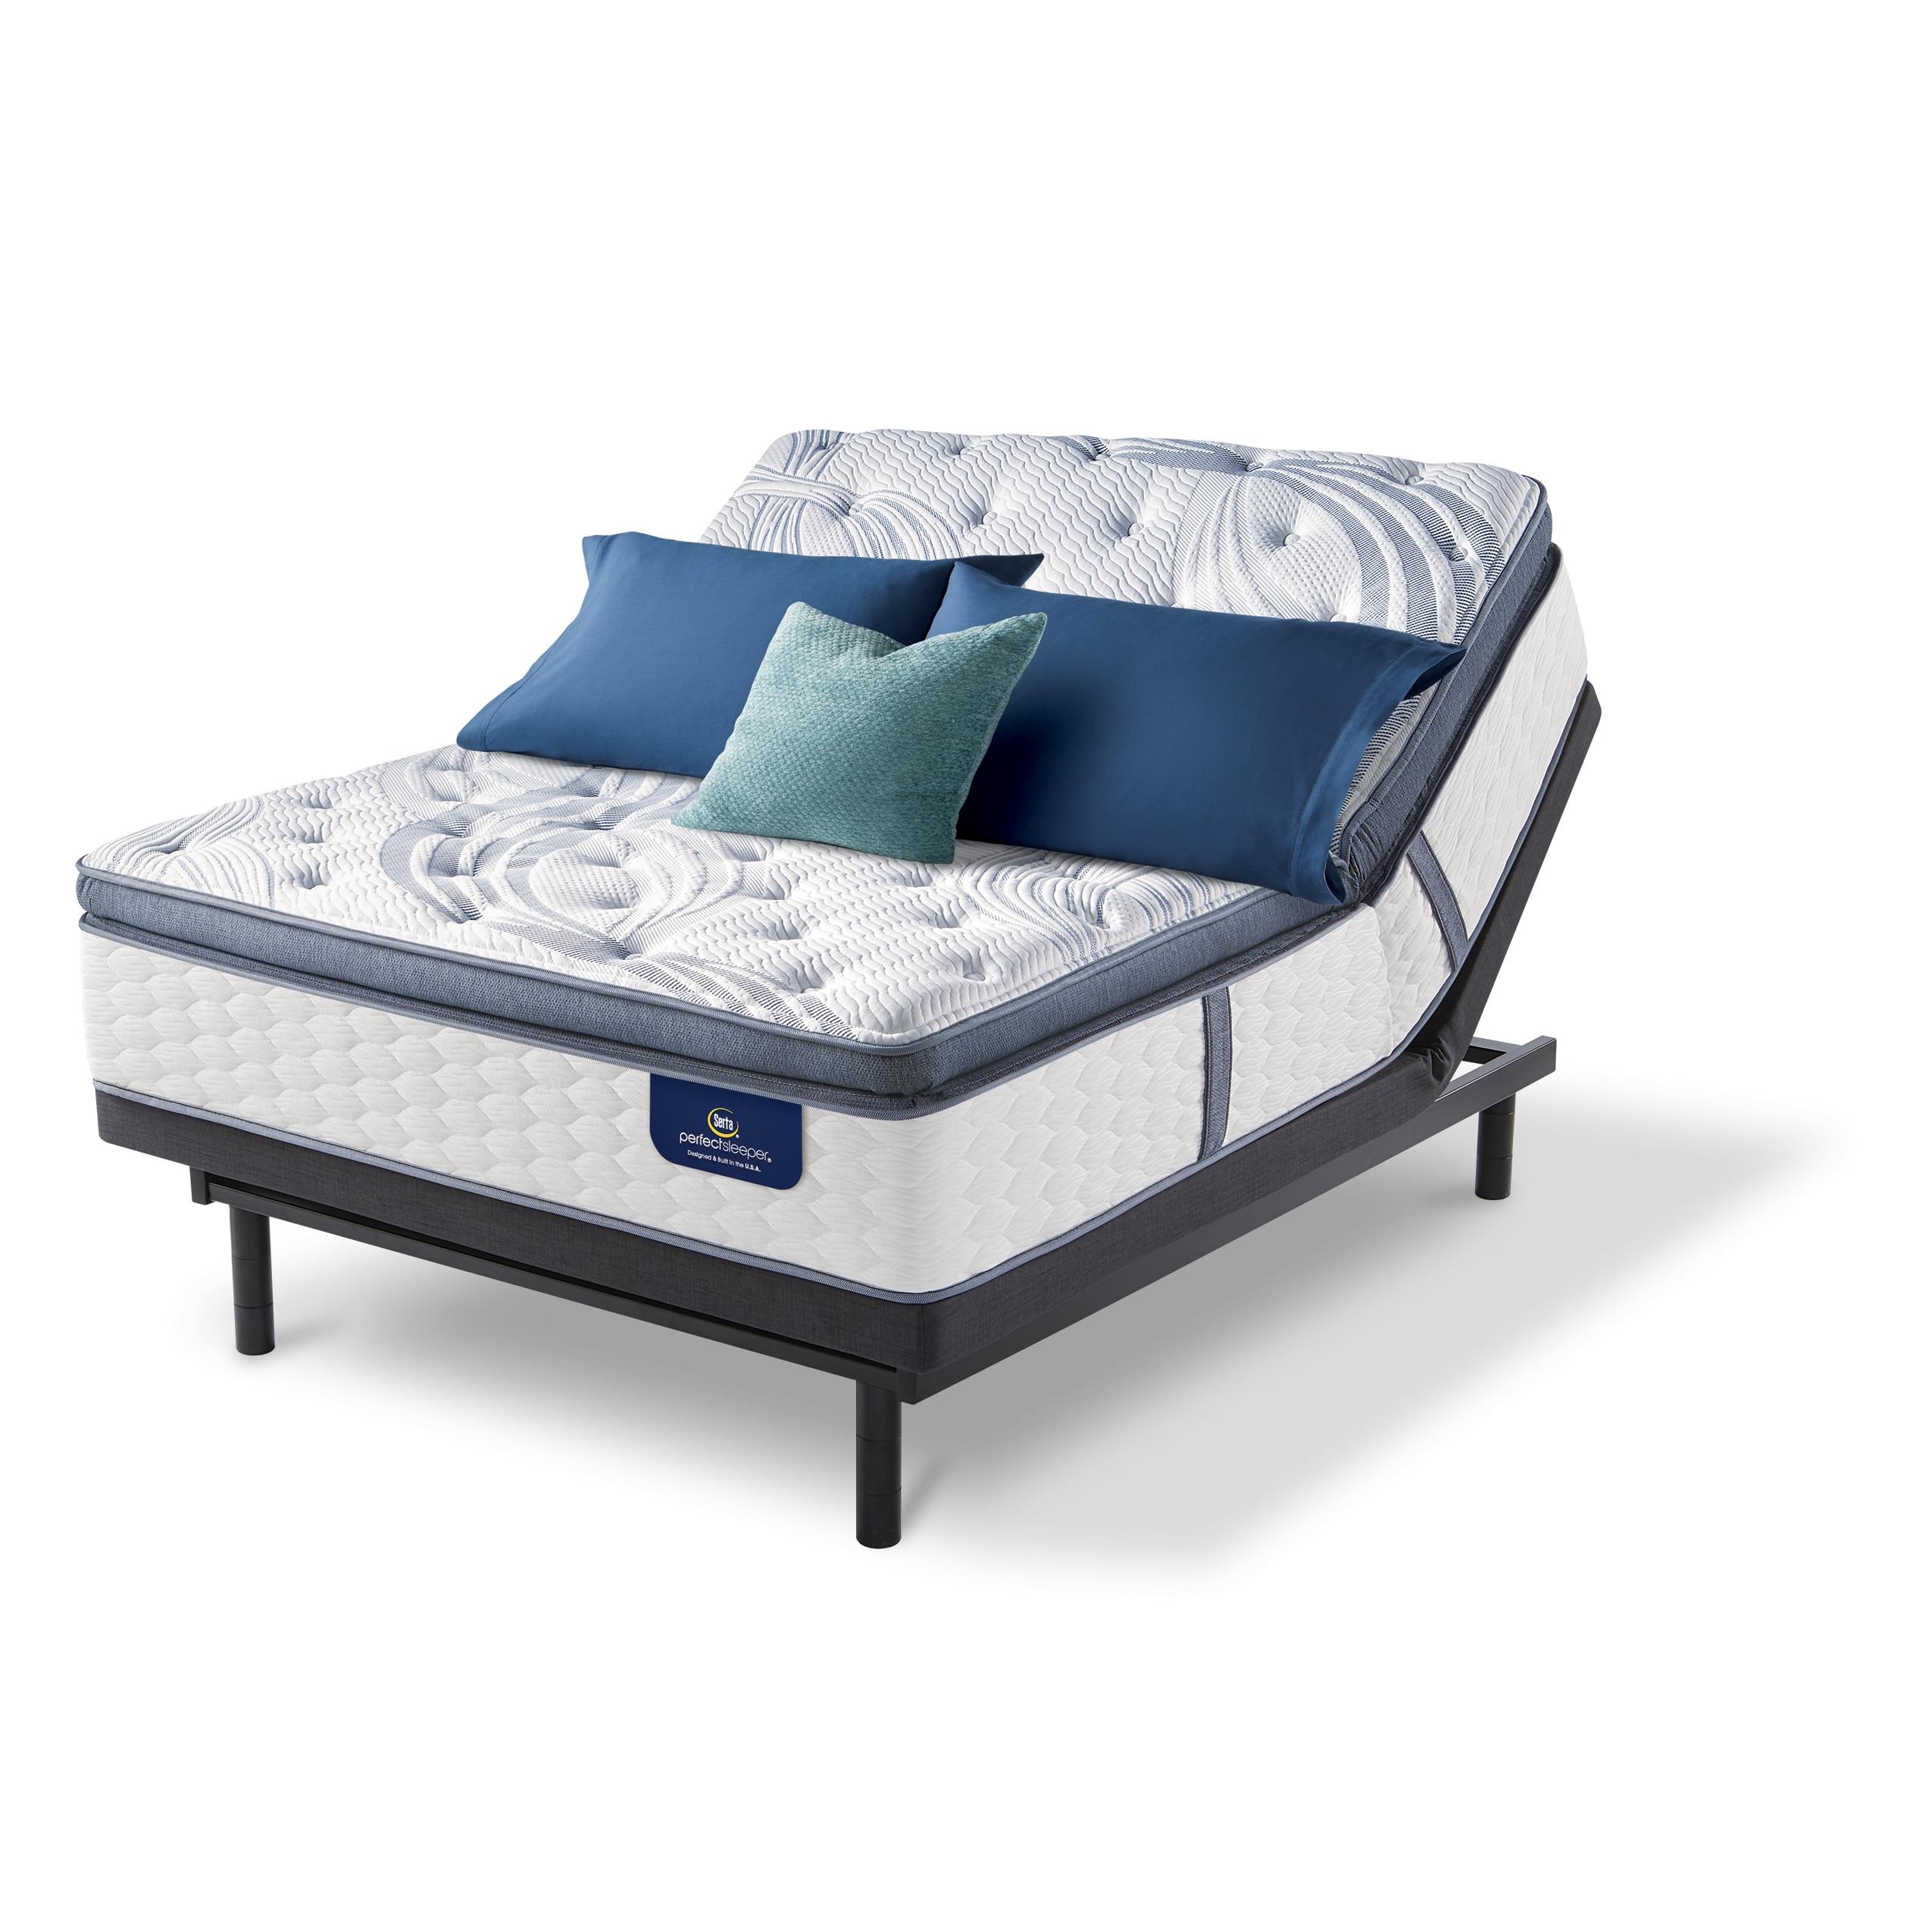 Shop Serta 13 Inch Brightmore Super Pillow Top Plush California King